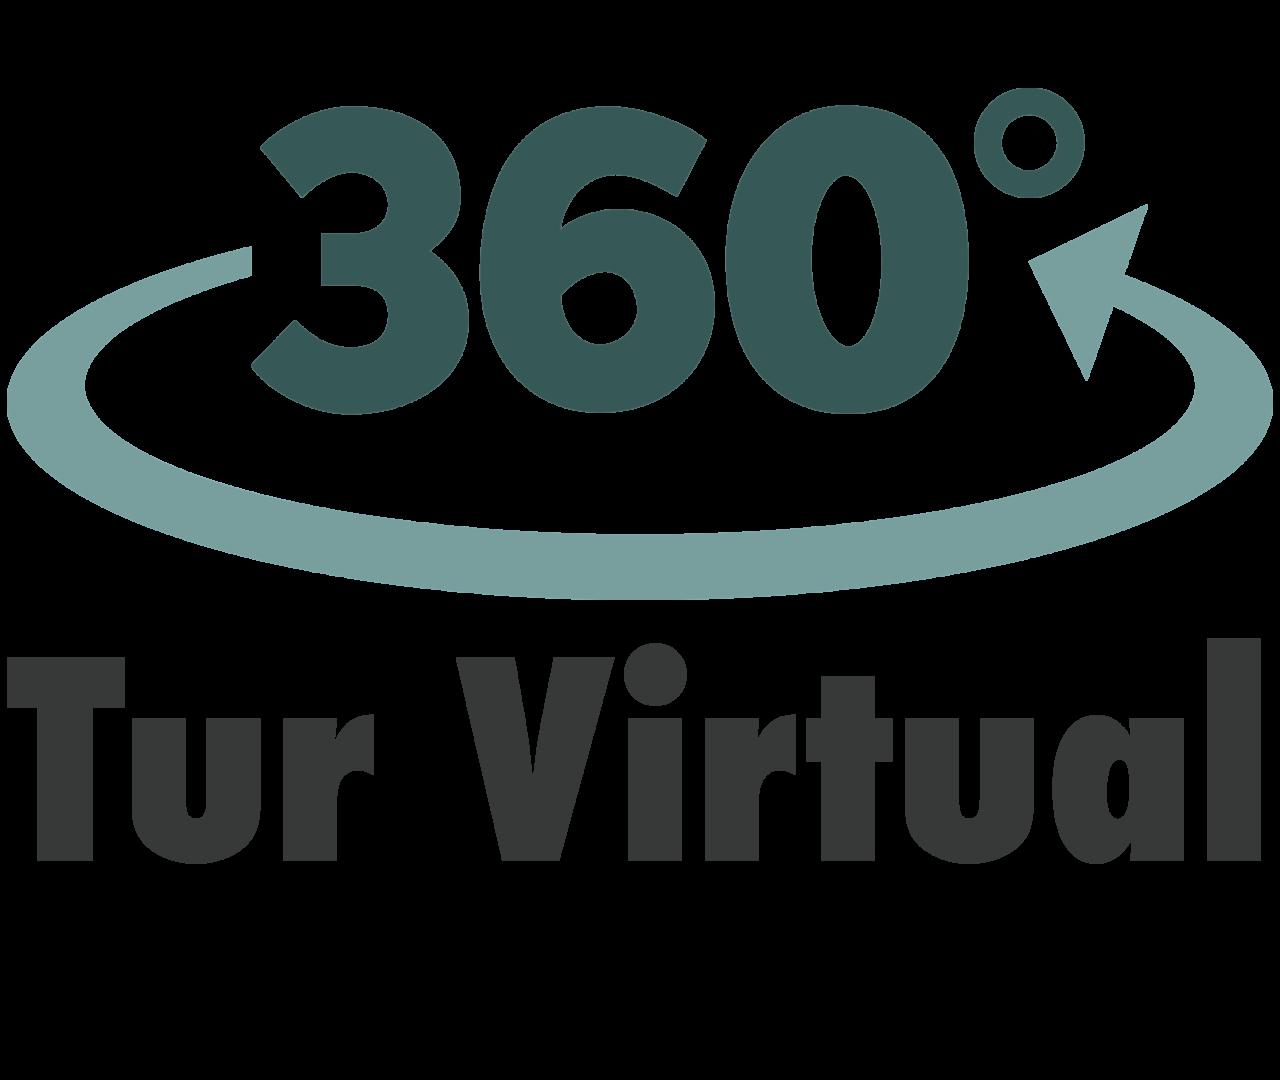 Tur 360 logo